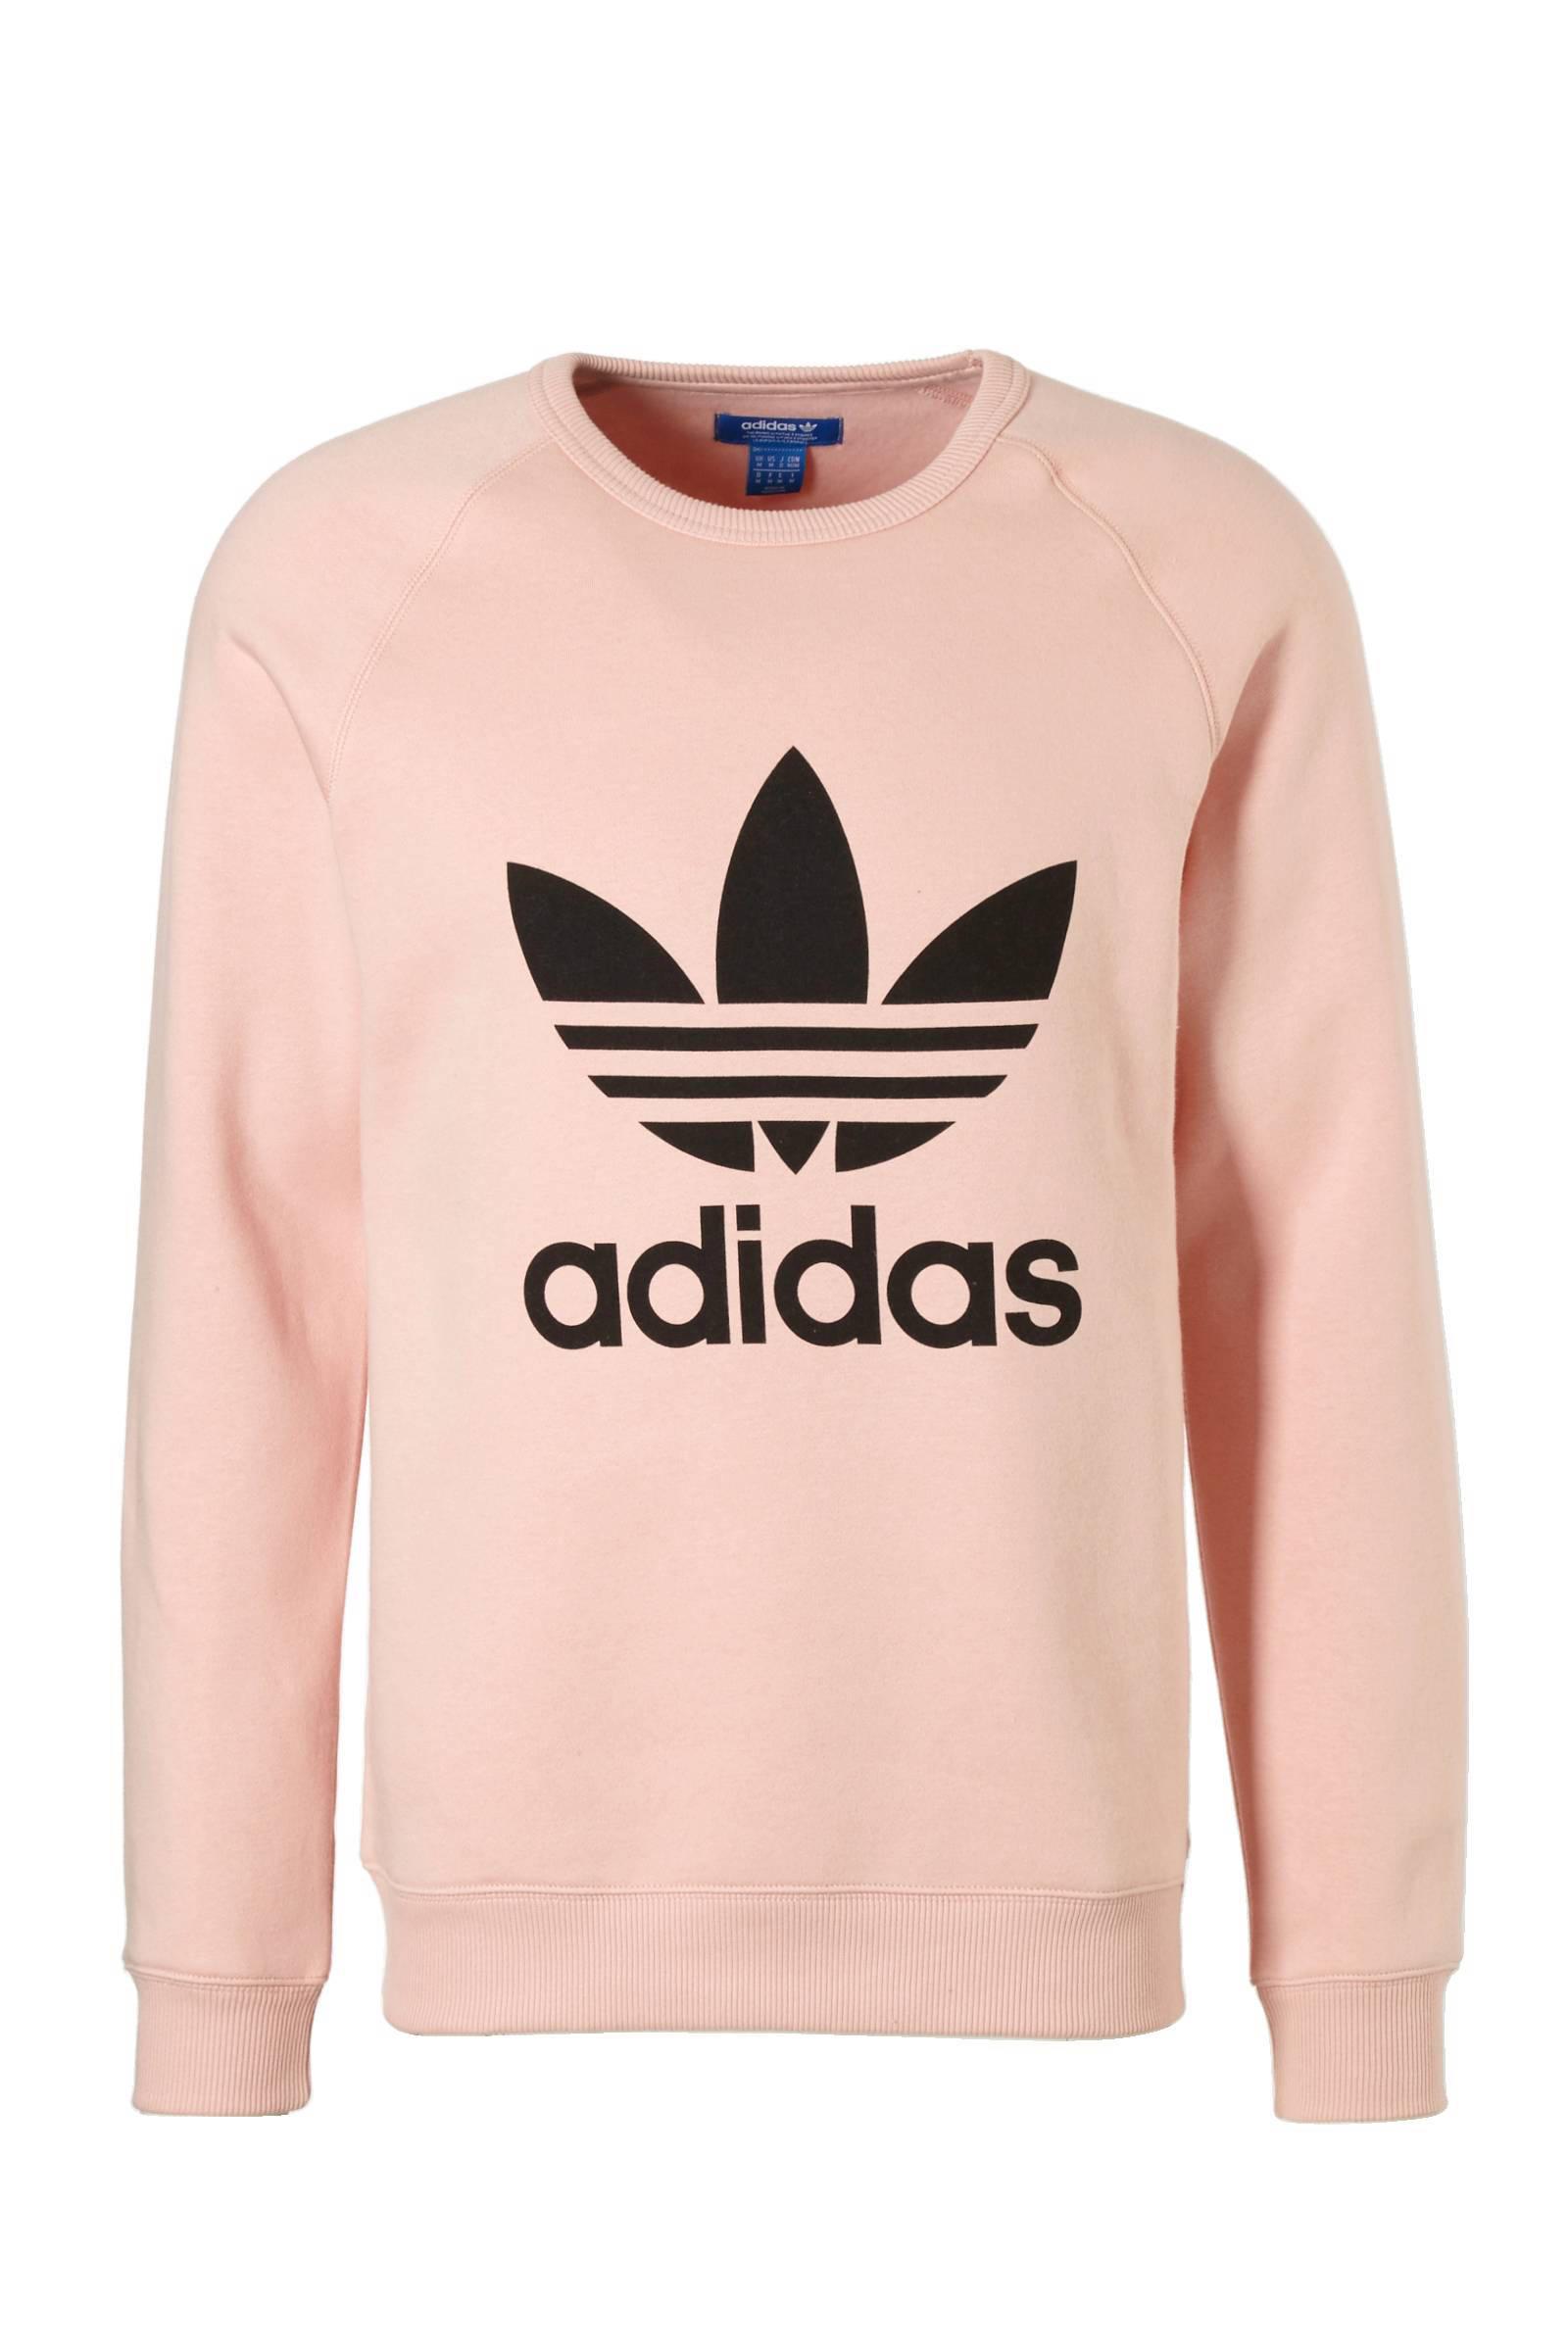 adidas sweater roze